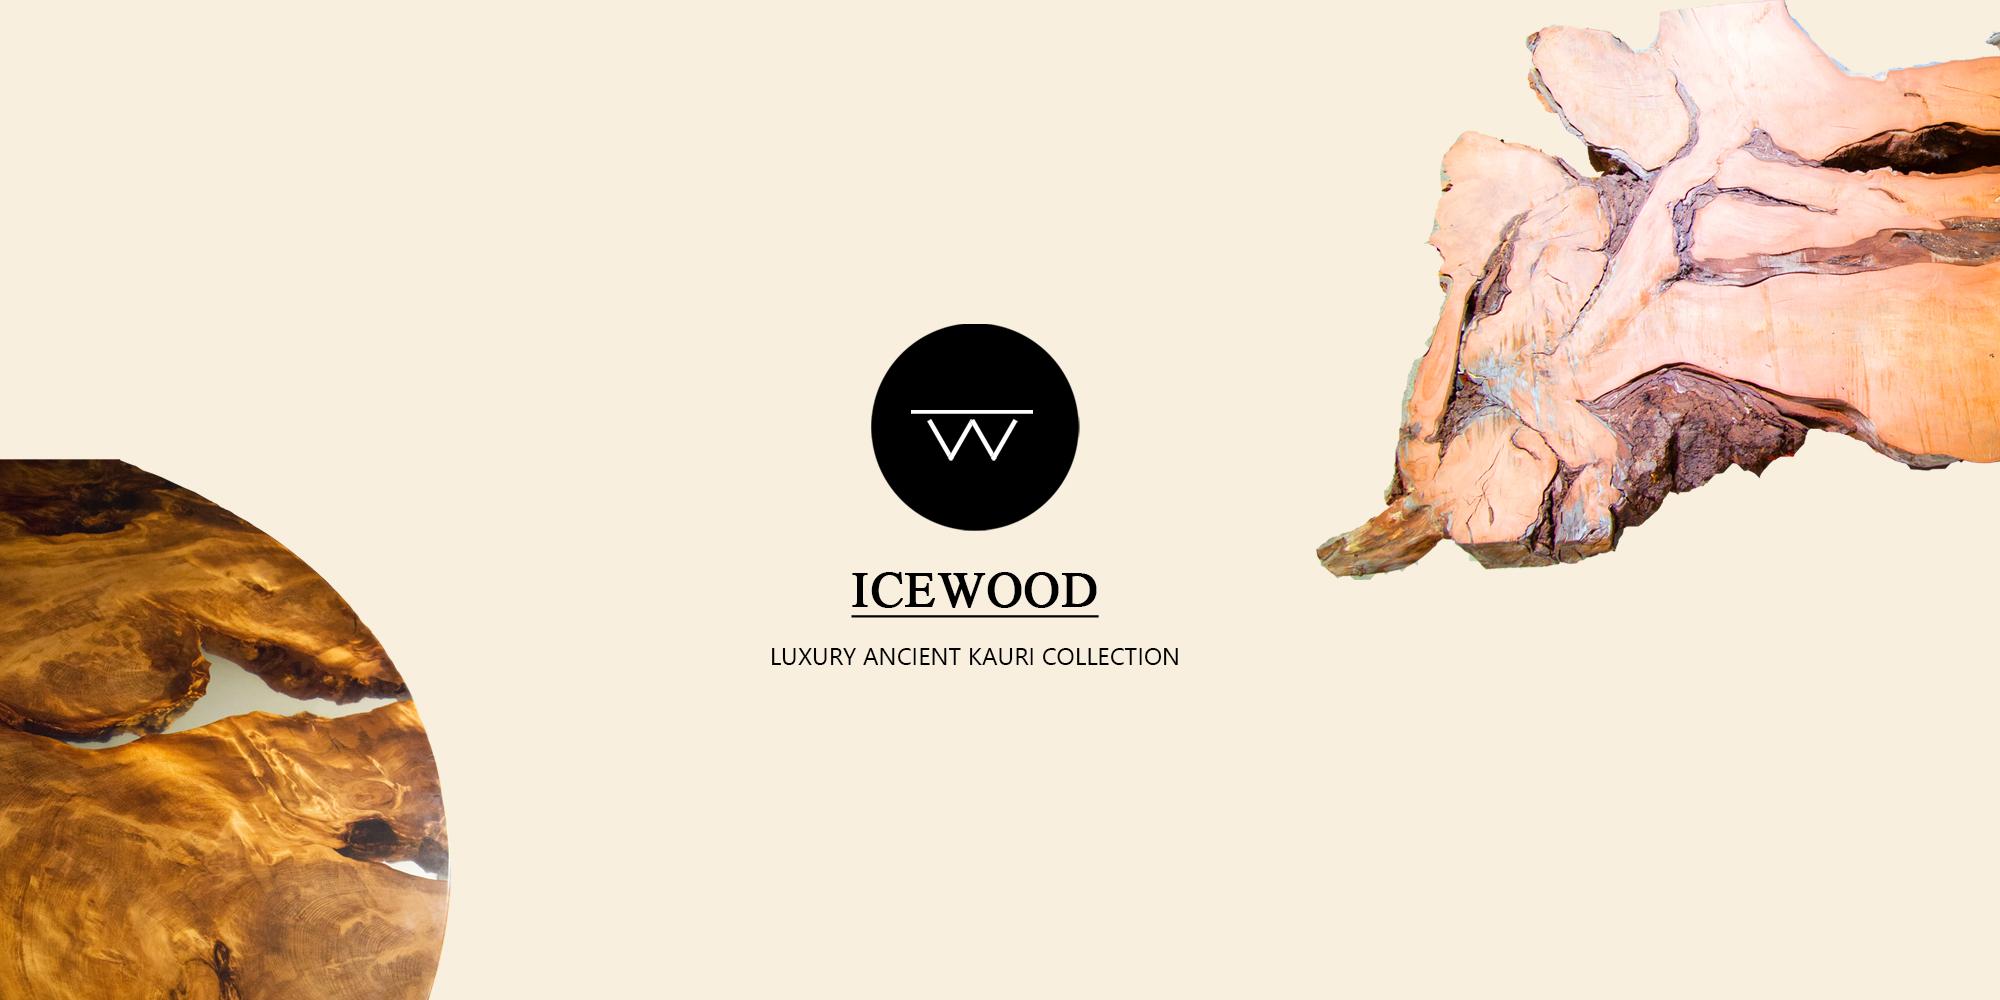 Icewood Ancient Kauri